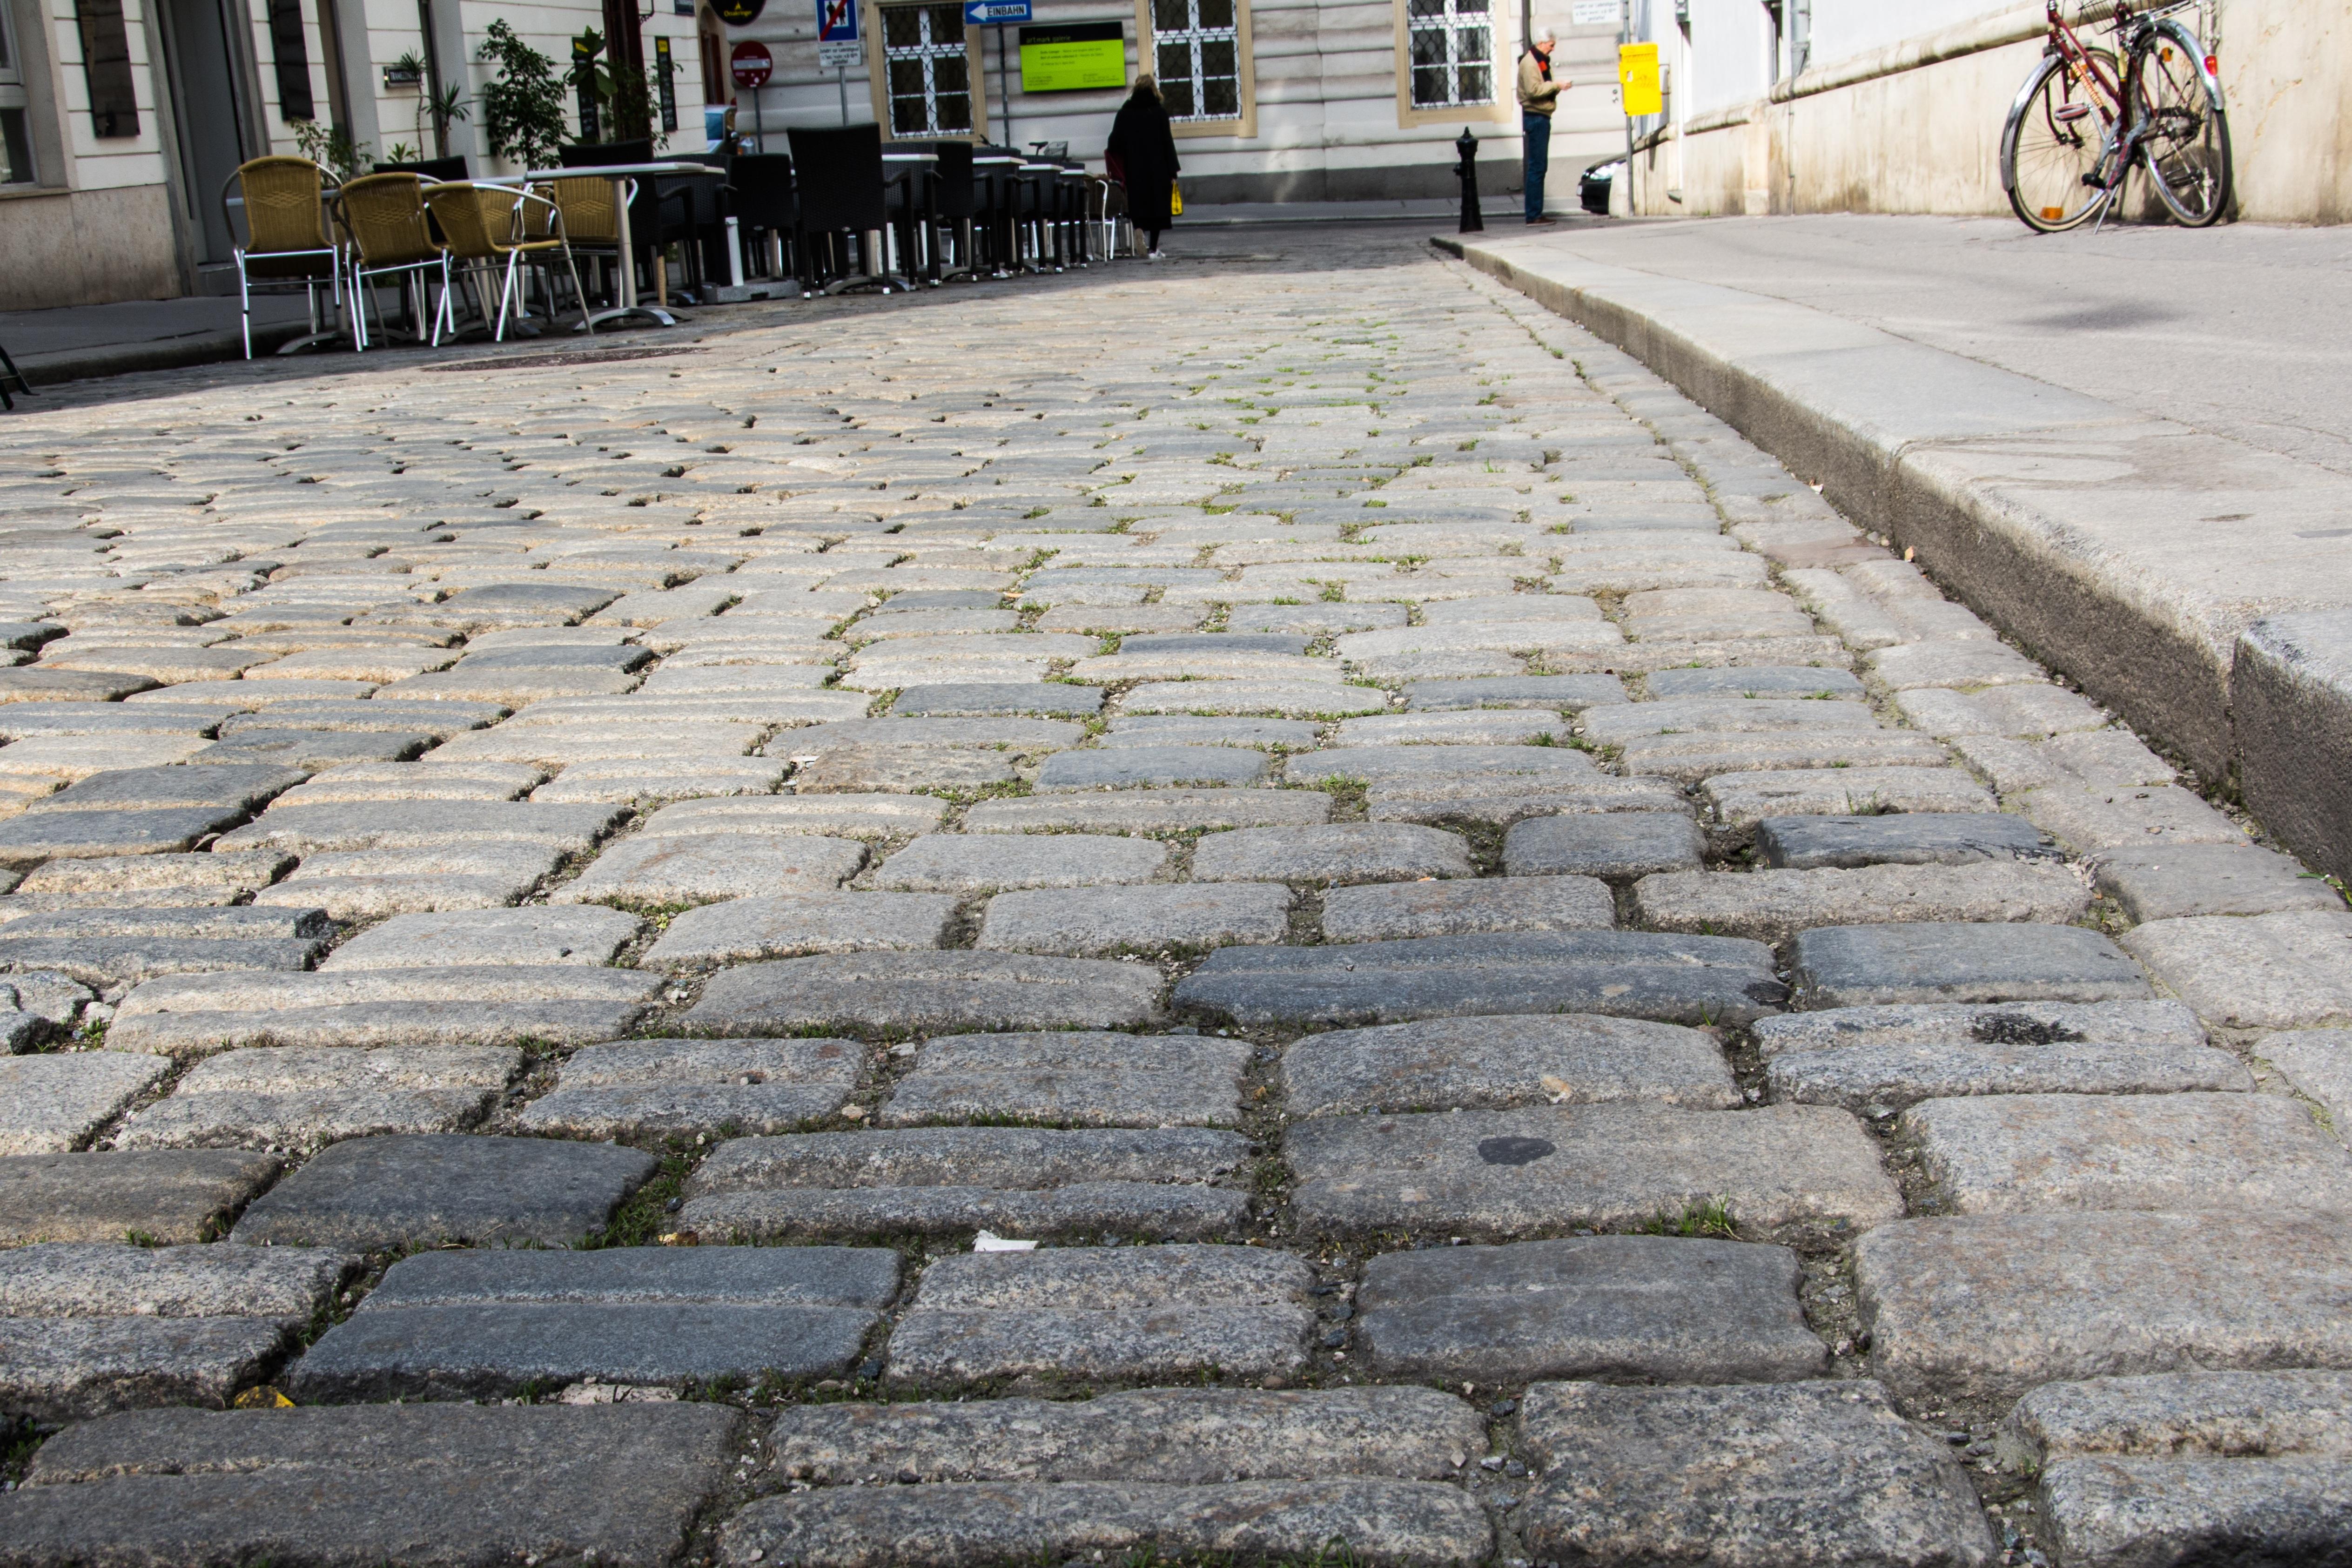 city asphalt walkway stone wall brick lane public space old town vienna driveway paving stones pedestrian zone